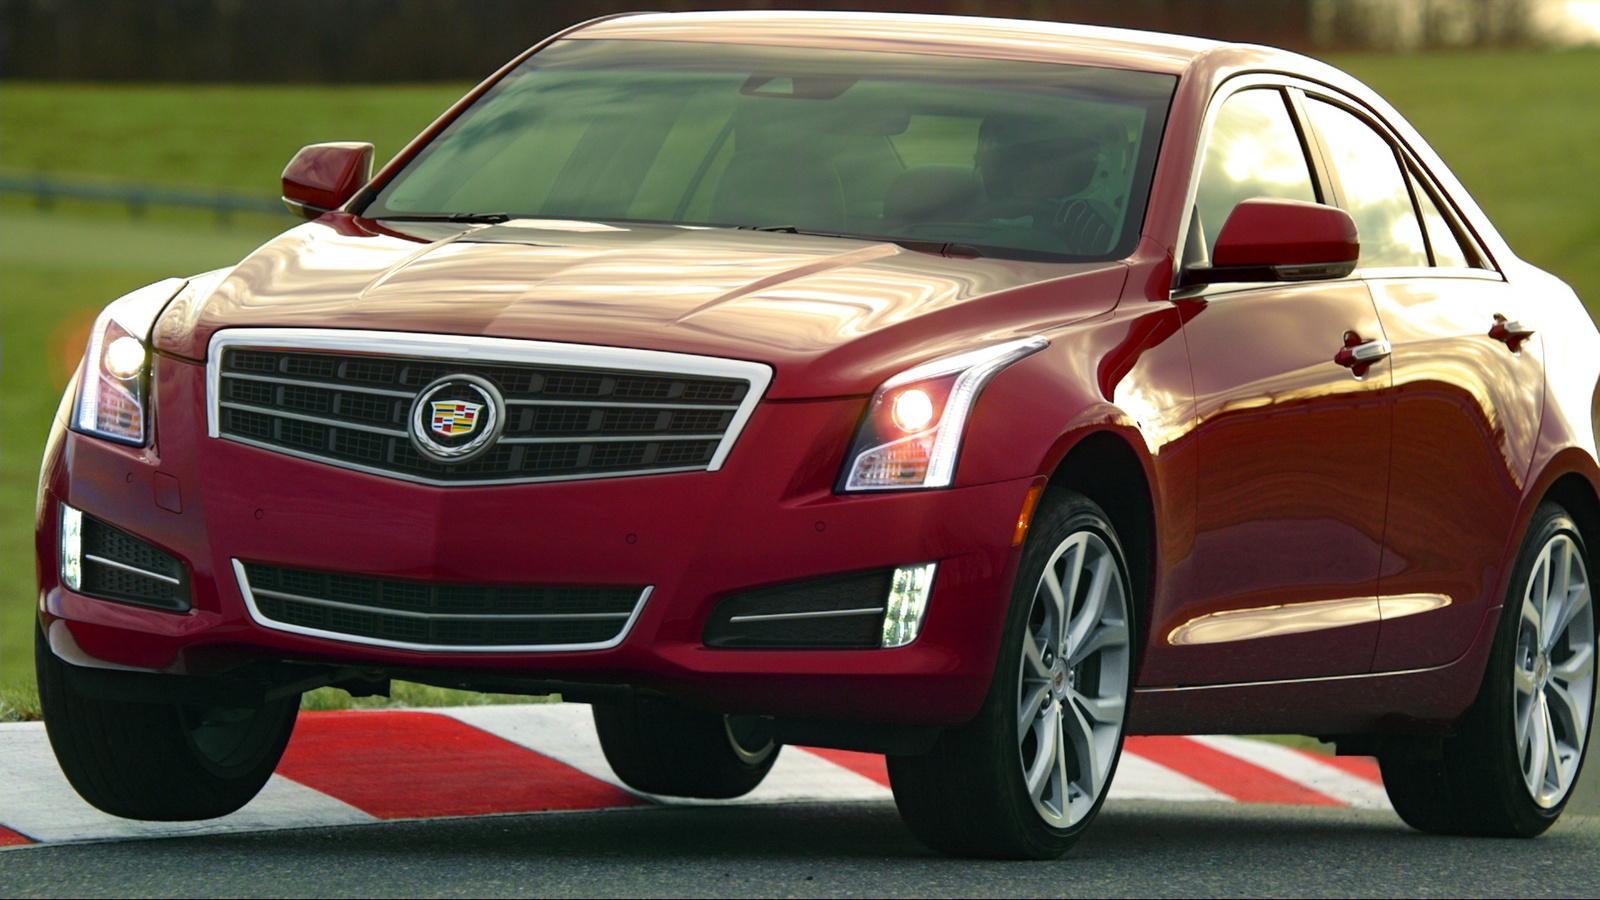 2013 Cadillac Ats Test Drive Review Cargurus